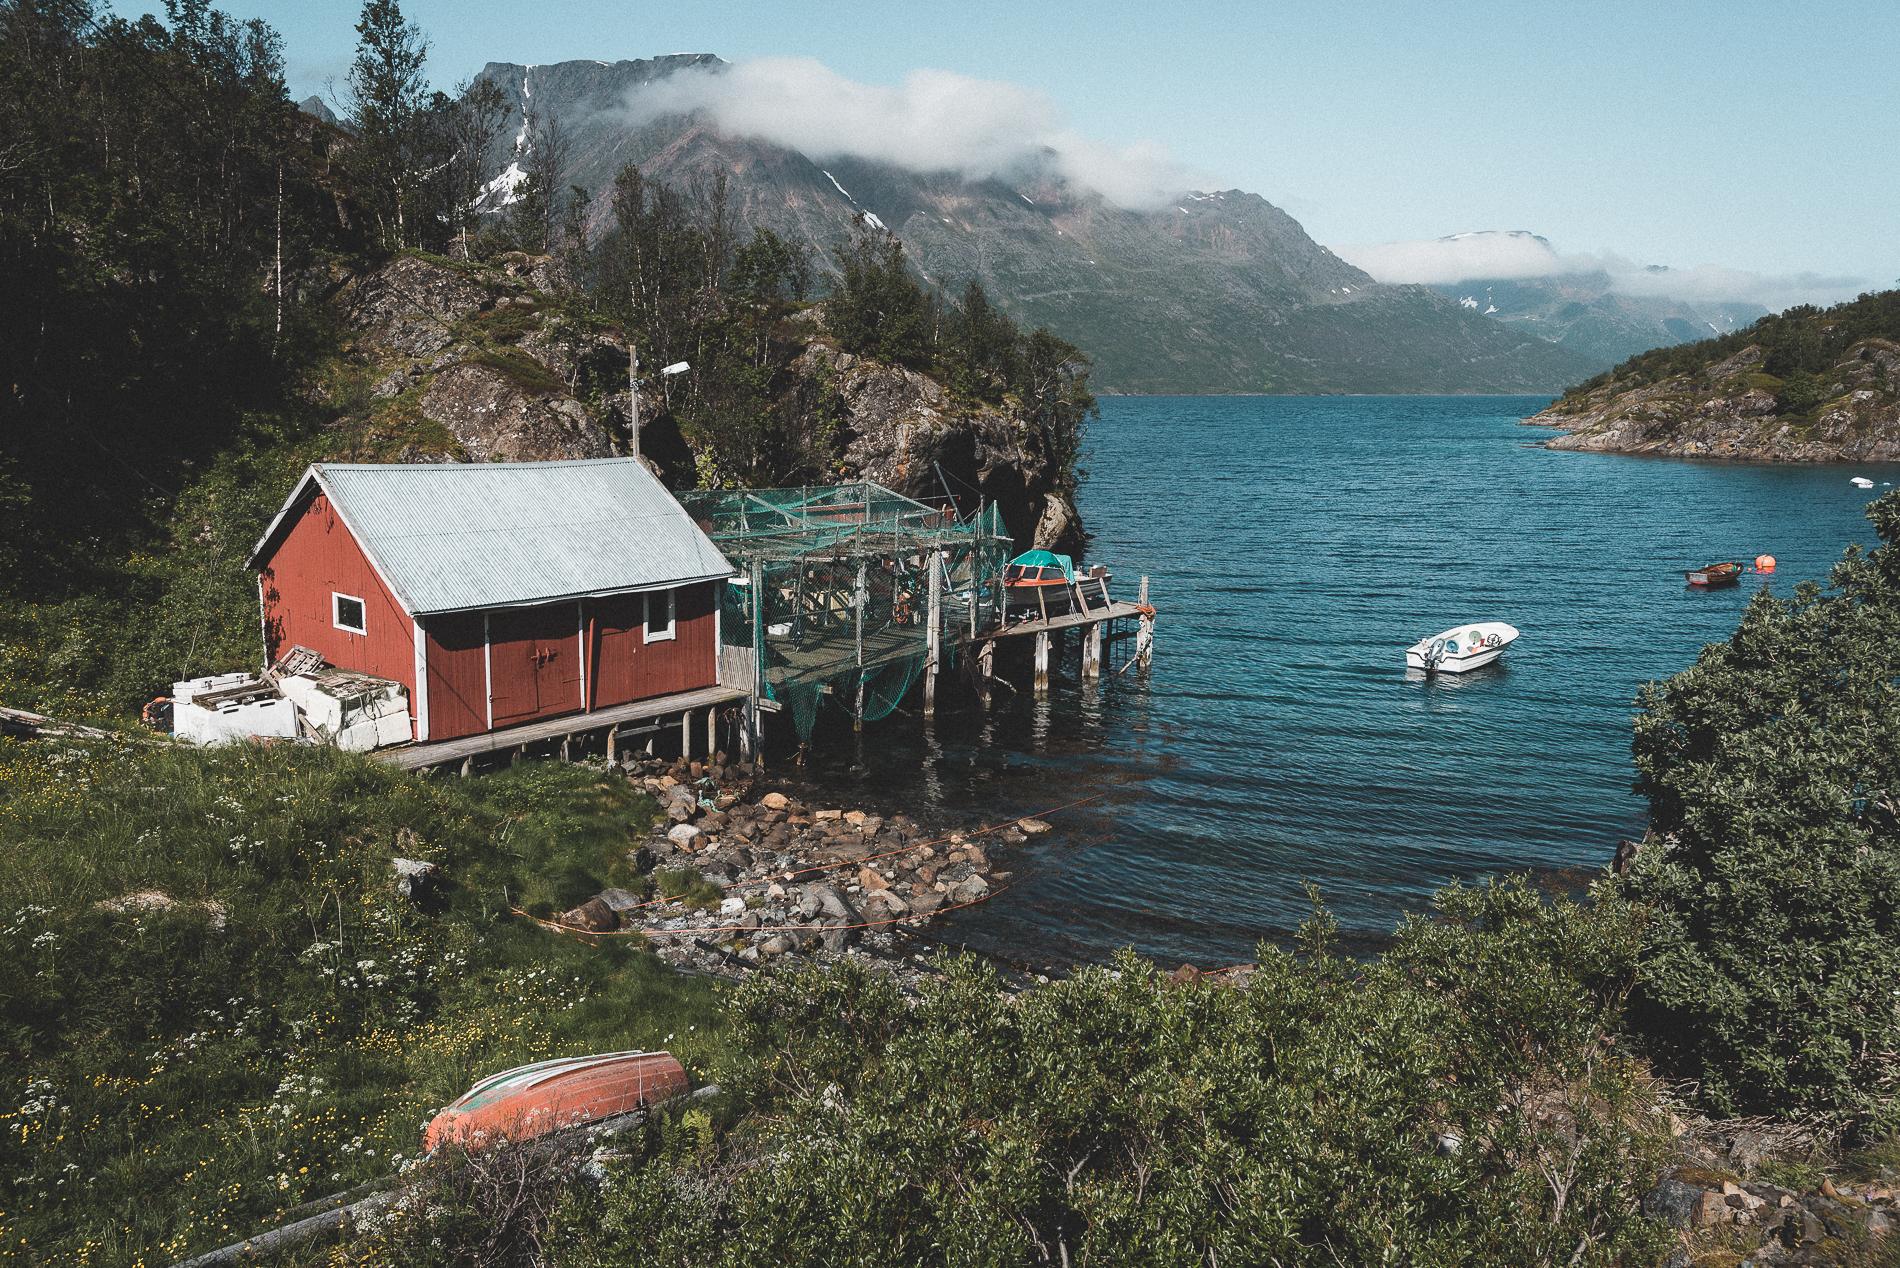 Oksfjordjokelen Fjord, Norway